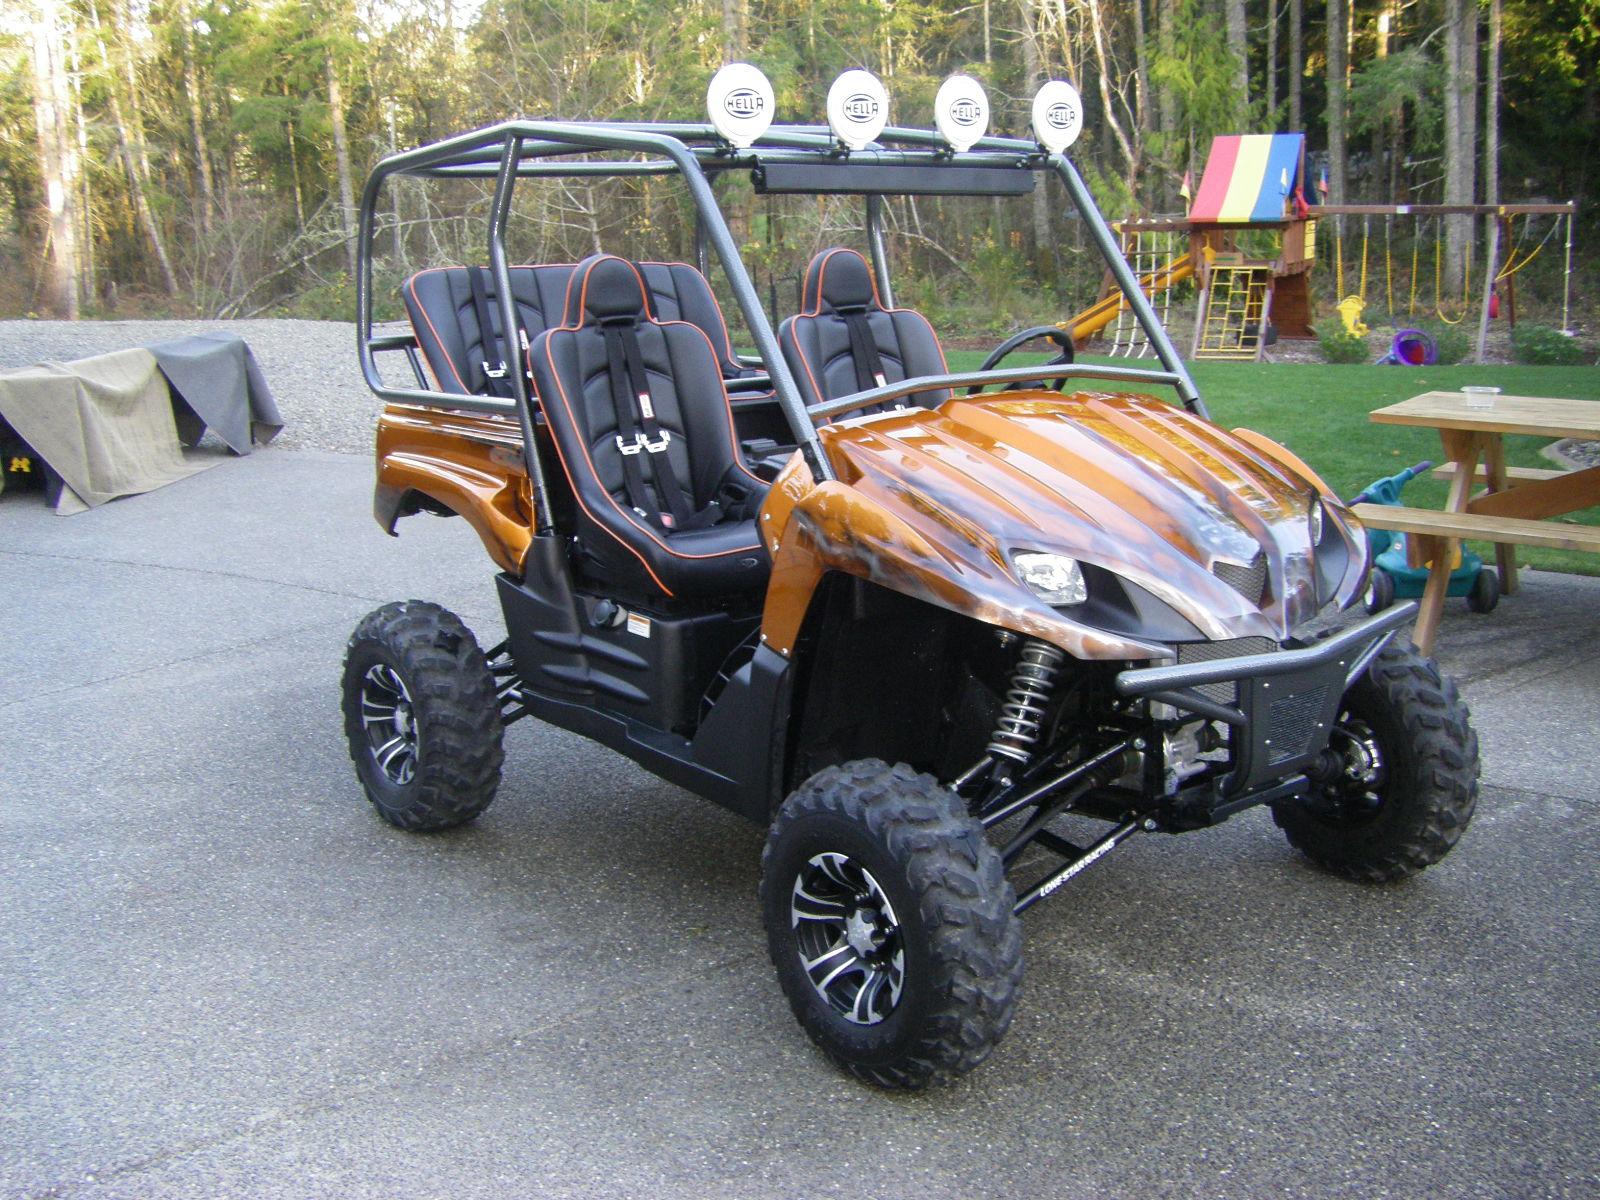 Utv Rear View Mirror >> utv crap NEW 4 seat cage and bench seat - Kawasaki Teryx Forum